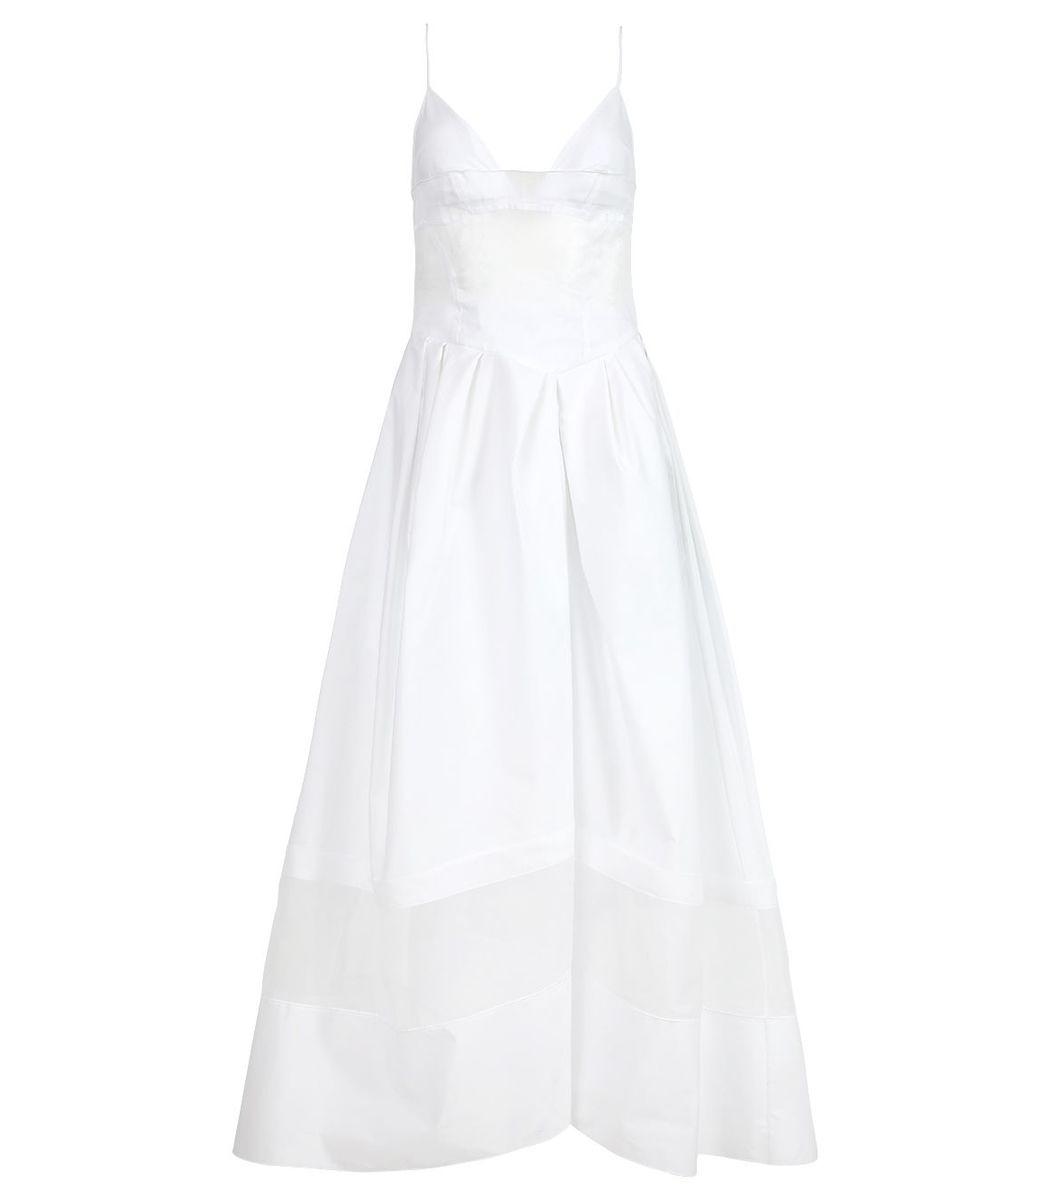 Rosie Assoulin Layered Cami Dress, White